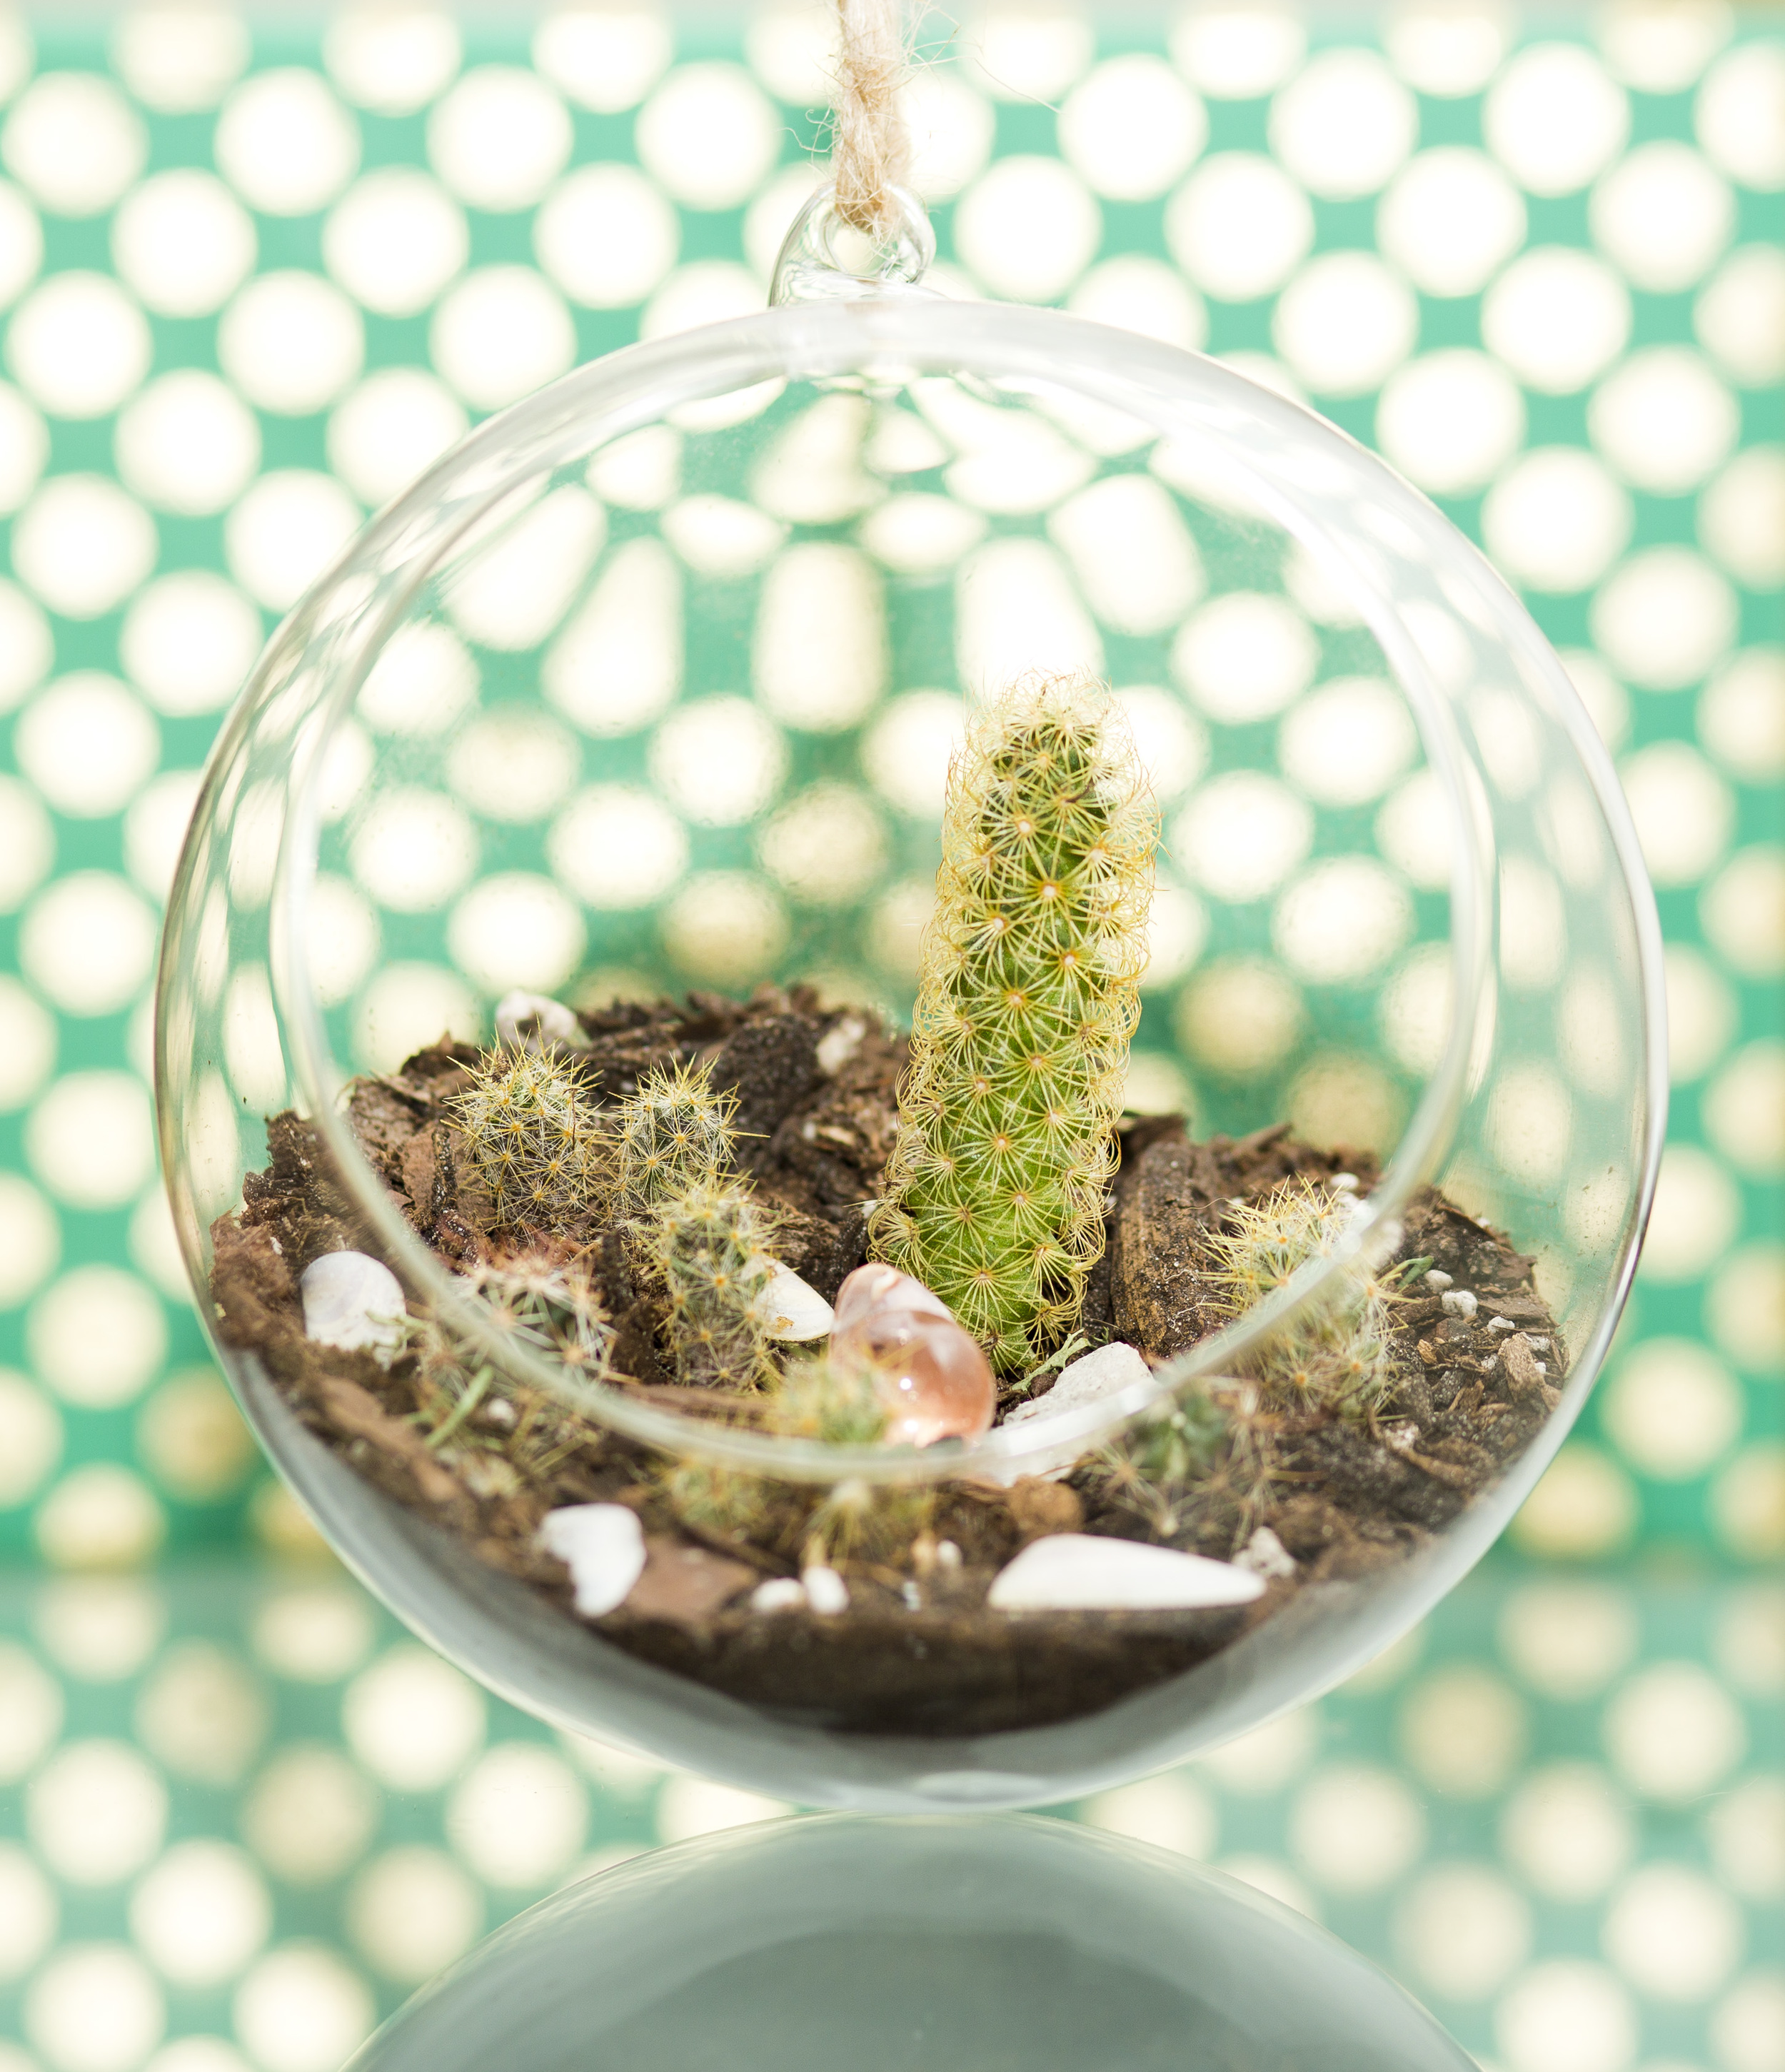 I spent my Sunday creating a mini photo set for my little cacti arrangement